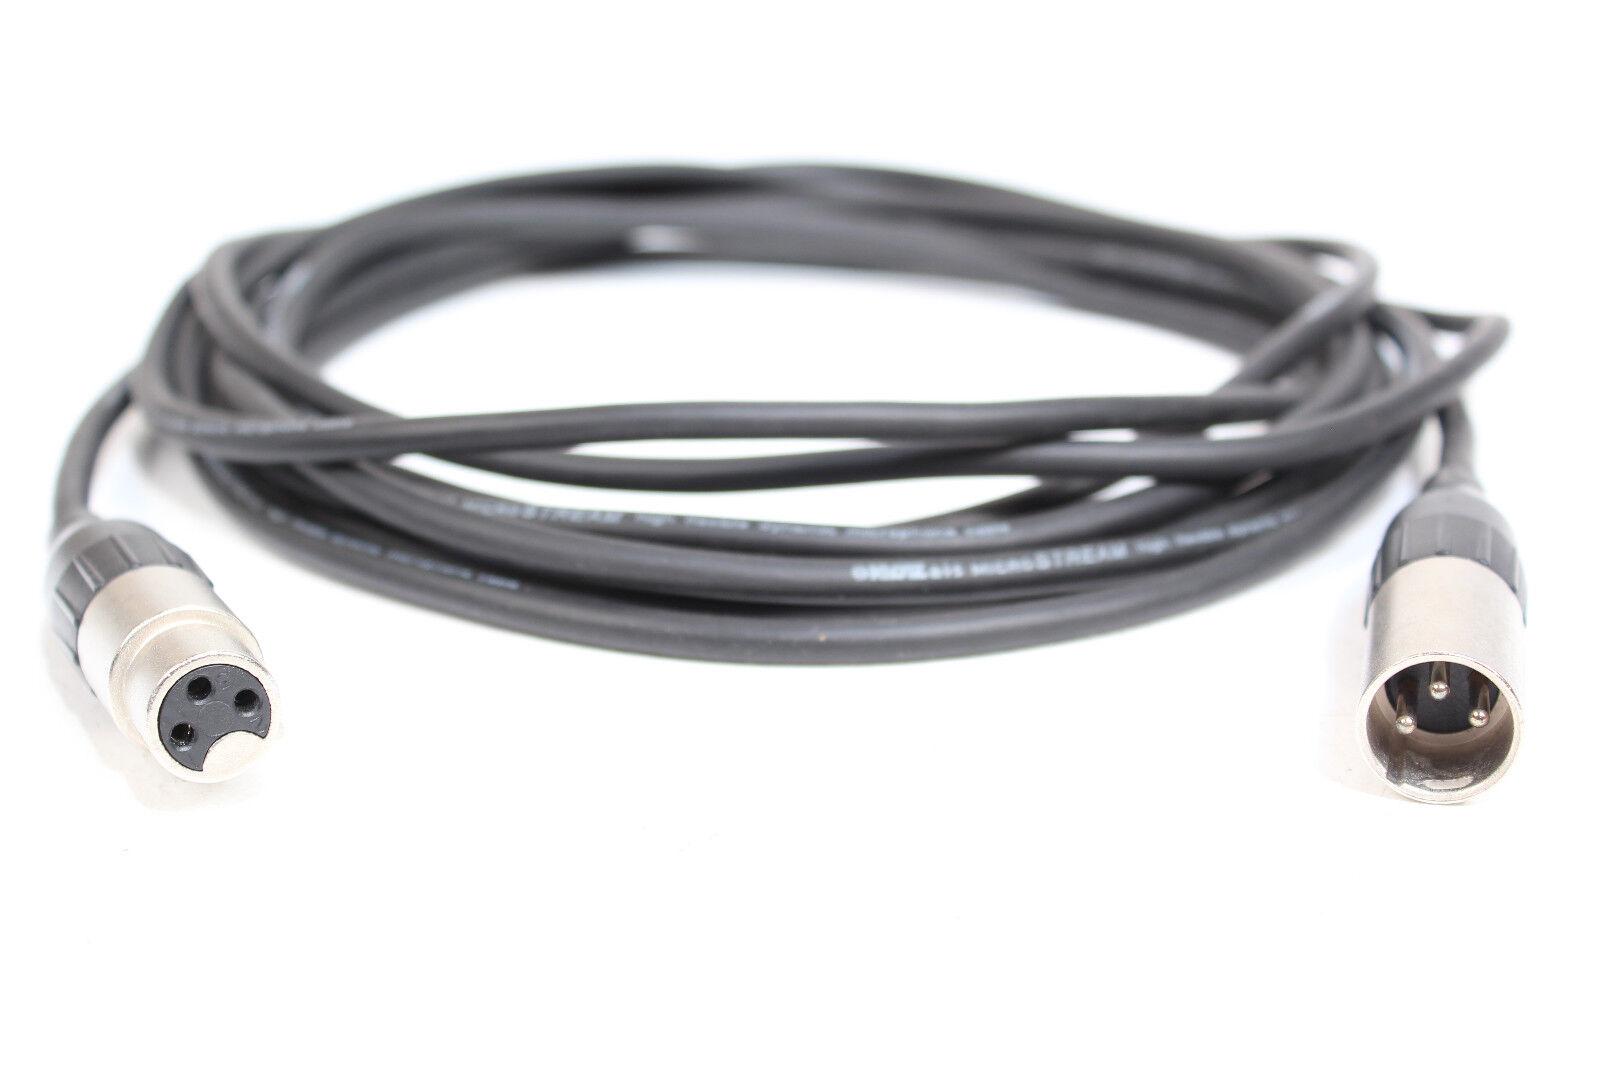 Klotz AIS MicroStream MicroStream MicroStream Micrófono Cable Xlrm-xlrf 15 ft (approx. 4.57 m). Alcatel XLR  promocionales de incentivo